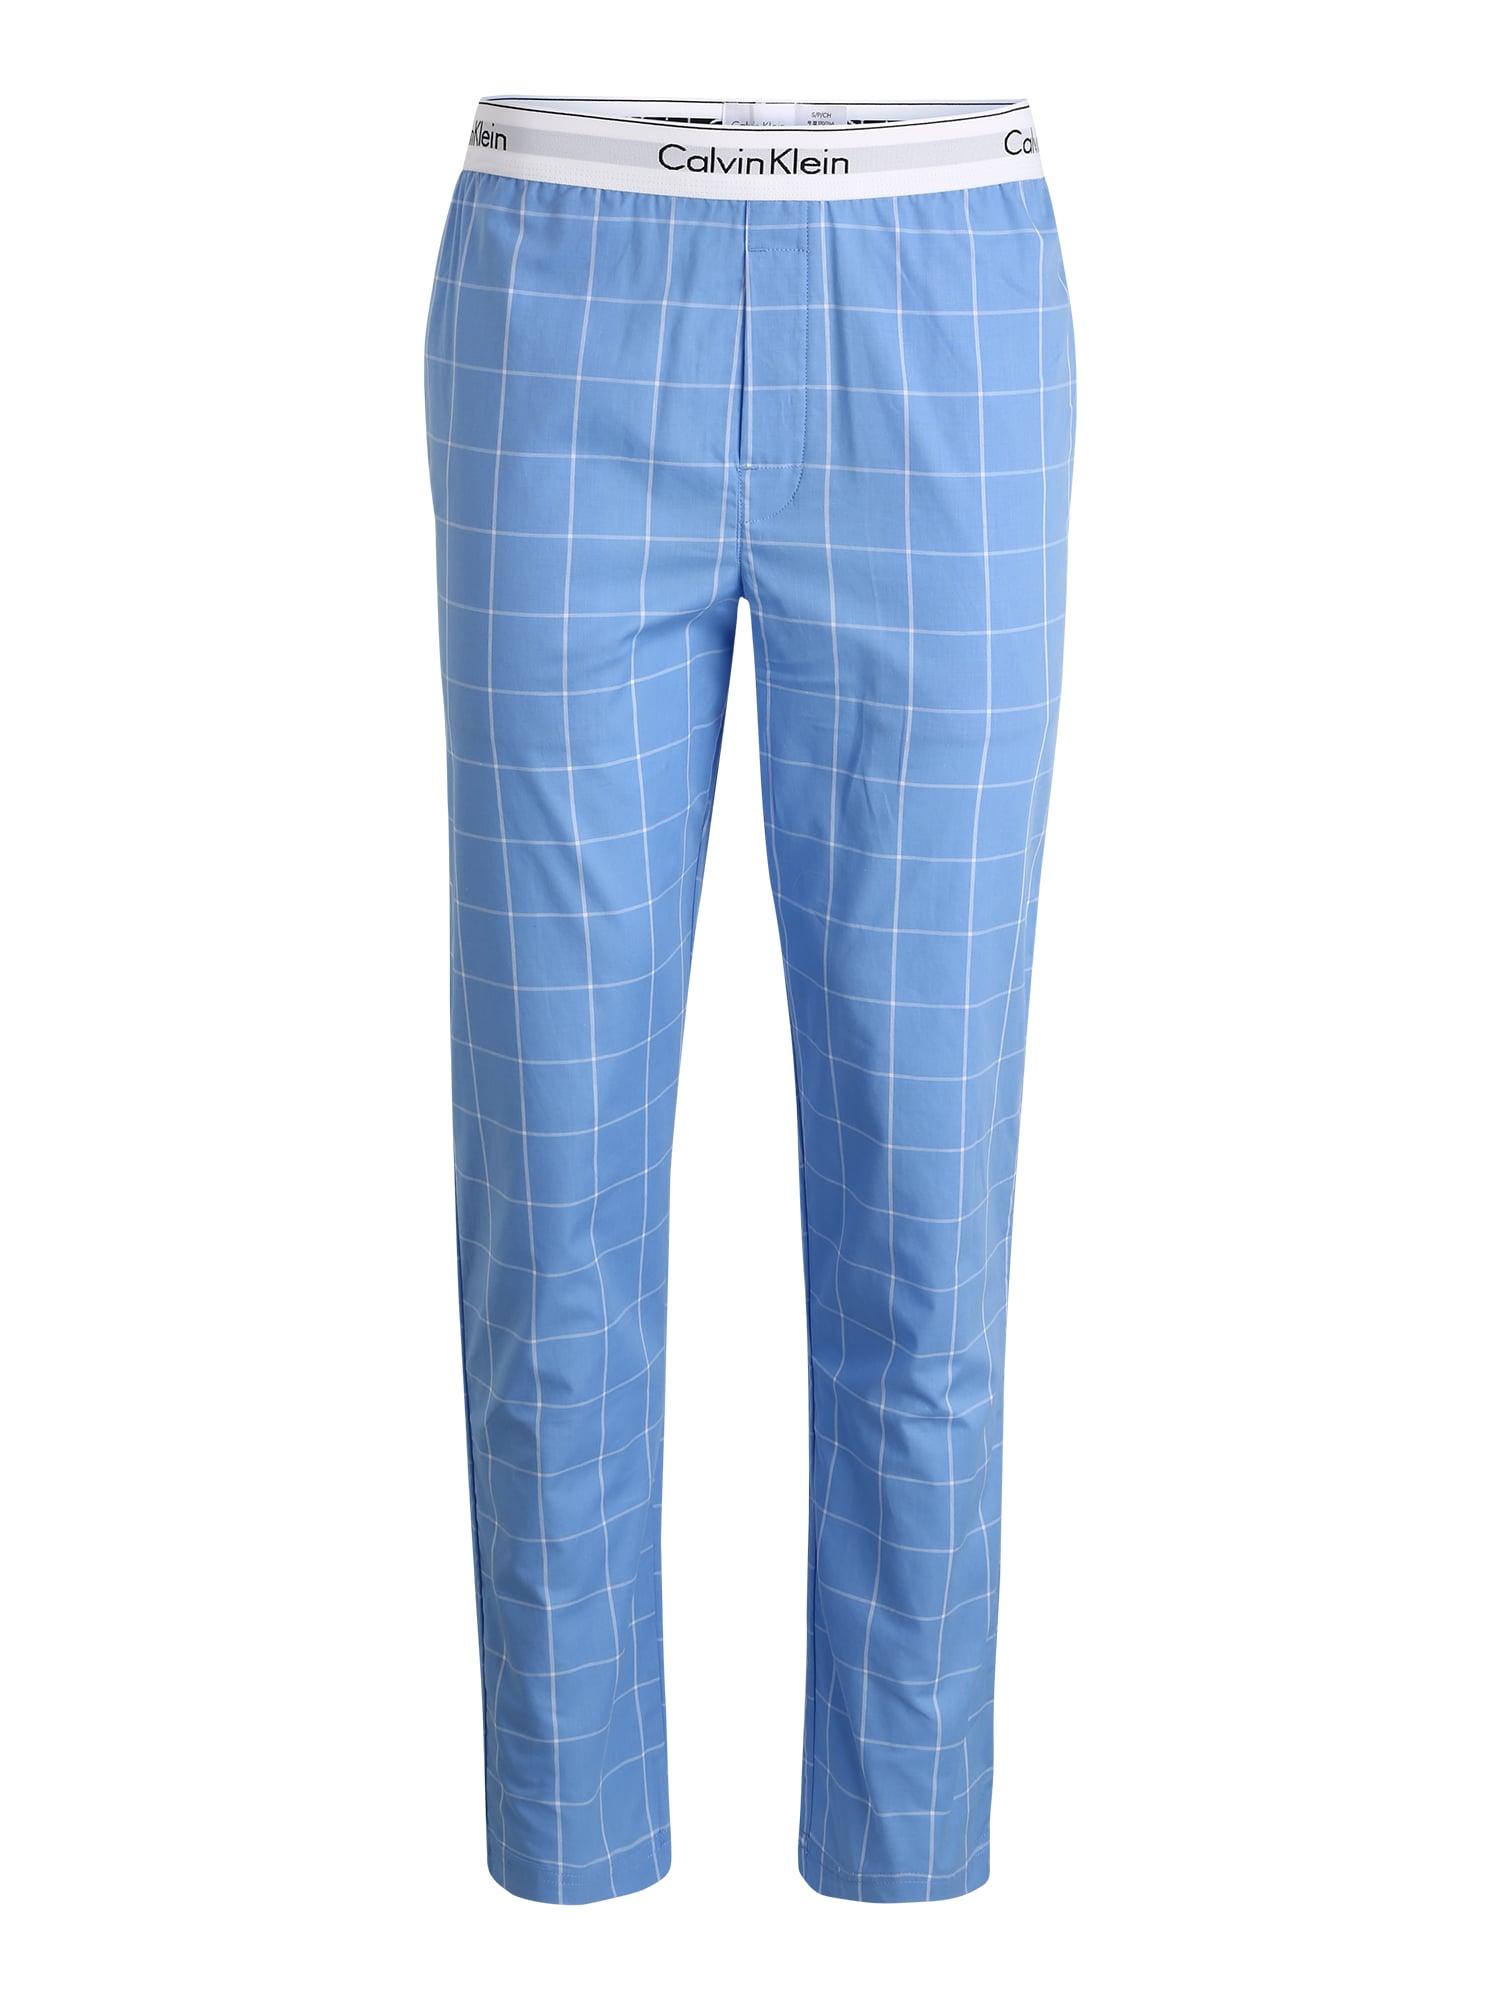 Calvin Klein Underwear Pižaminės kelnės 'SLEEP PANT' balta / mėlyna